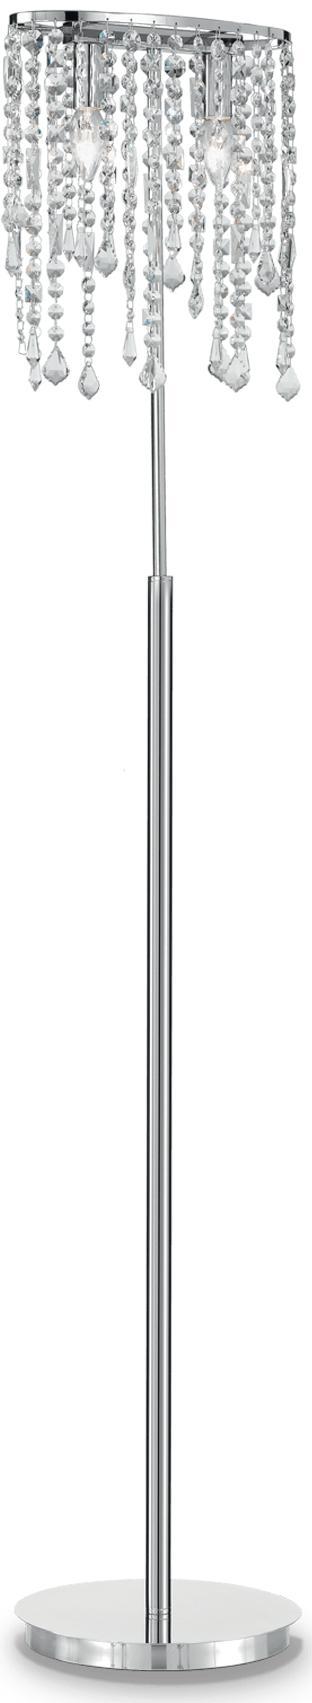 Ideal lux LED Rain Lampe stehende 2x5W 80277